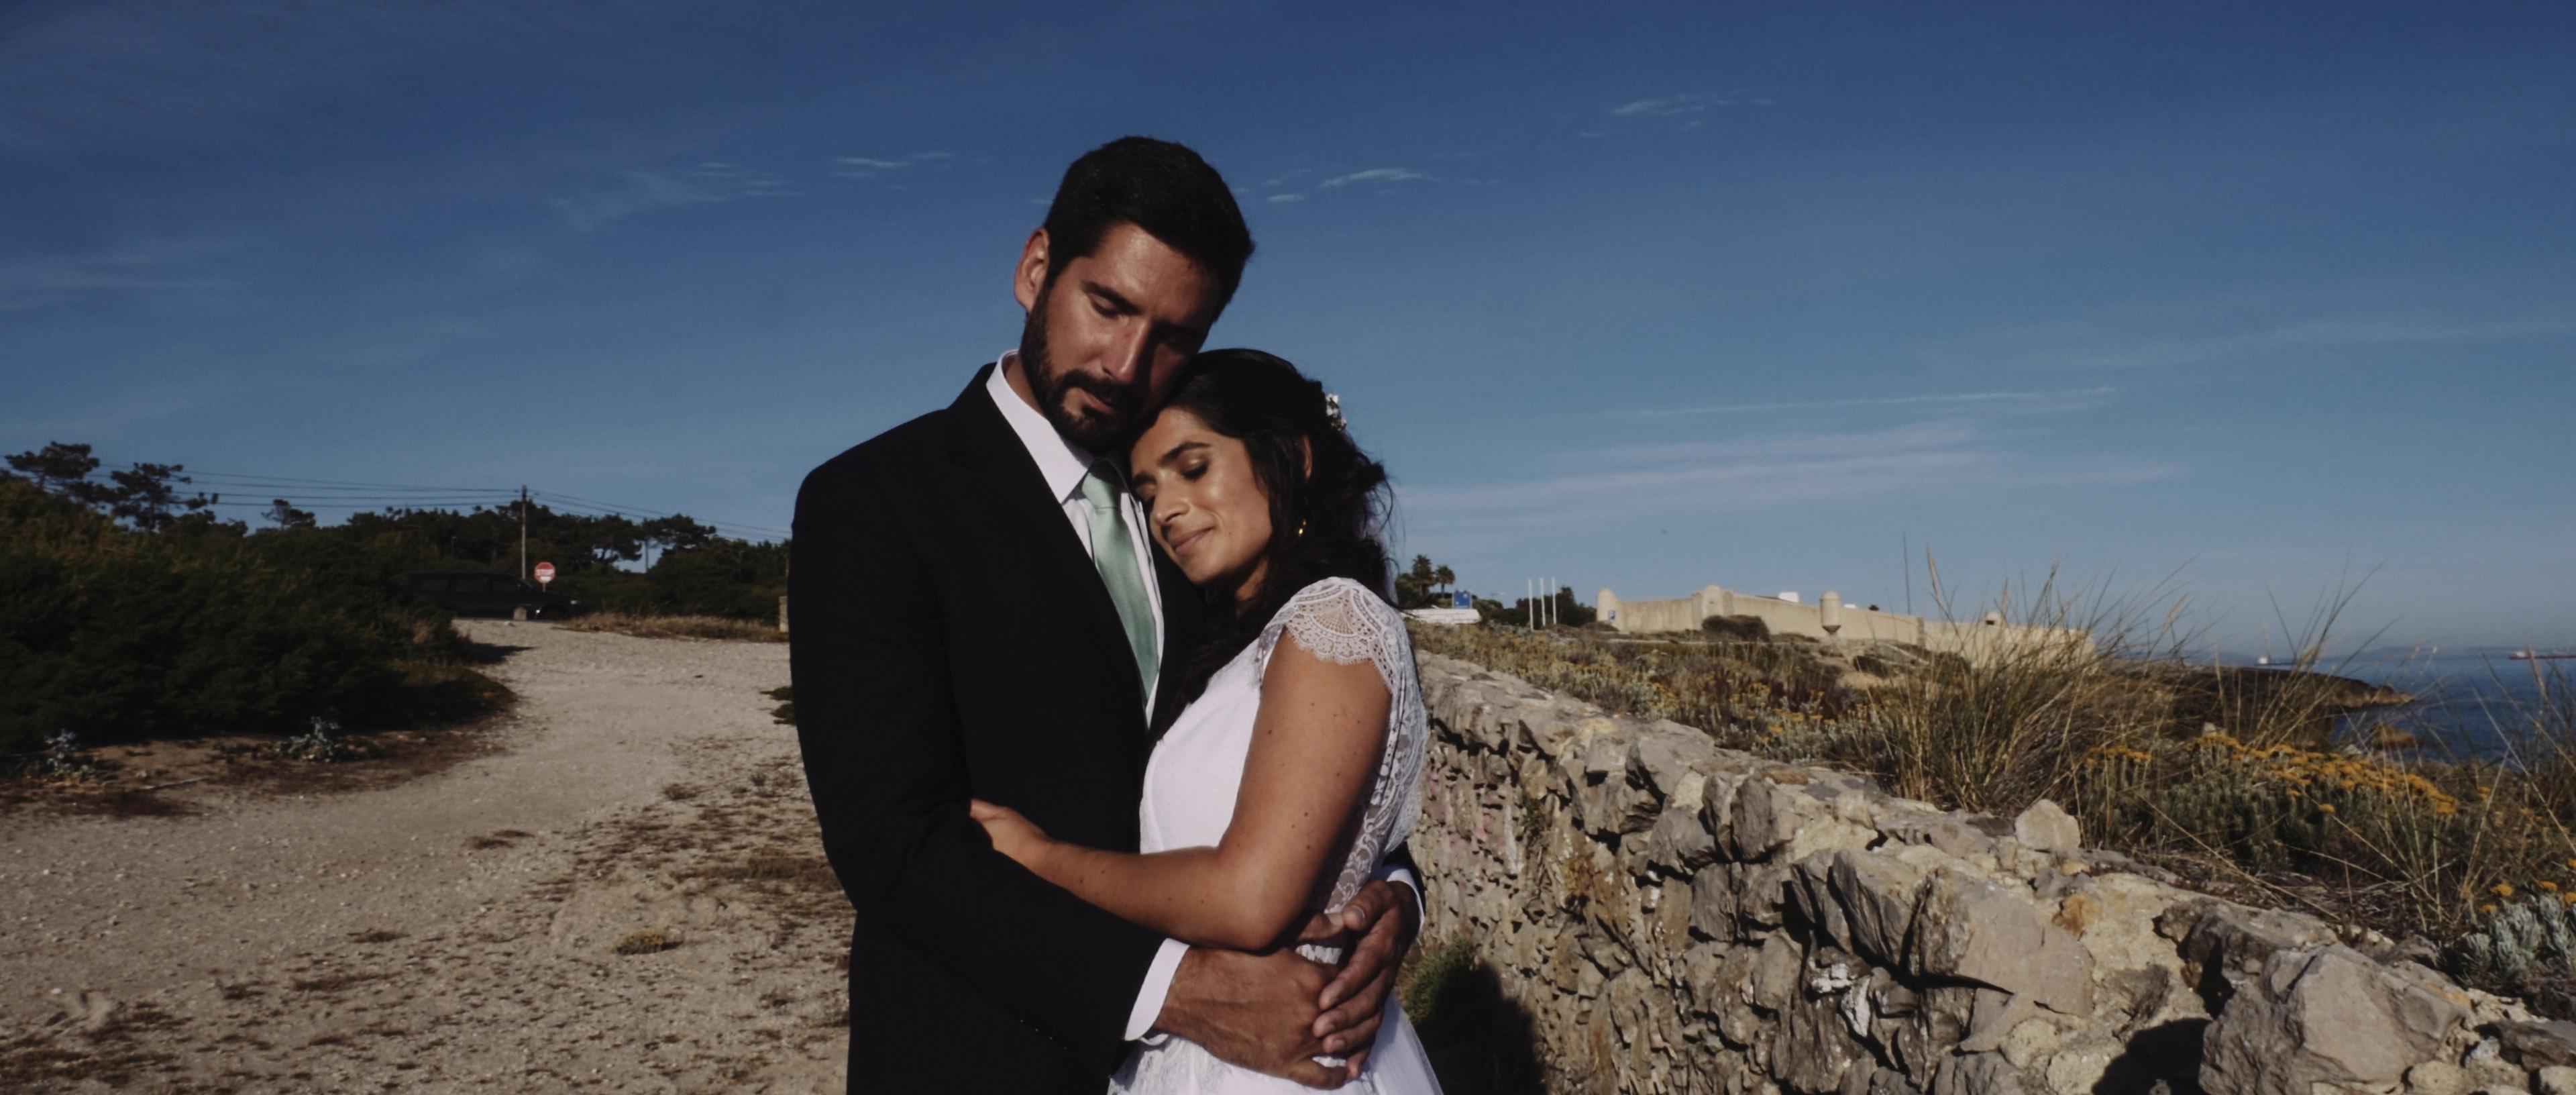 Cátia & Miguel - Wedding